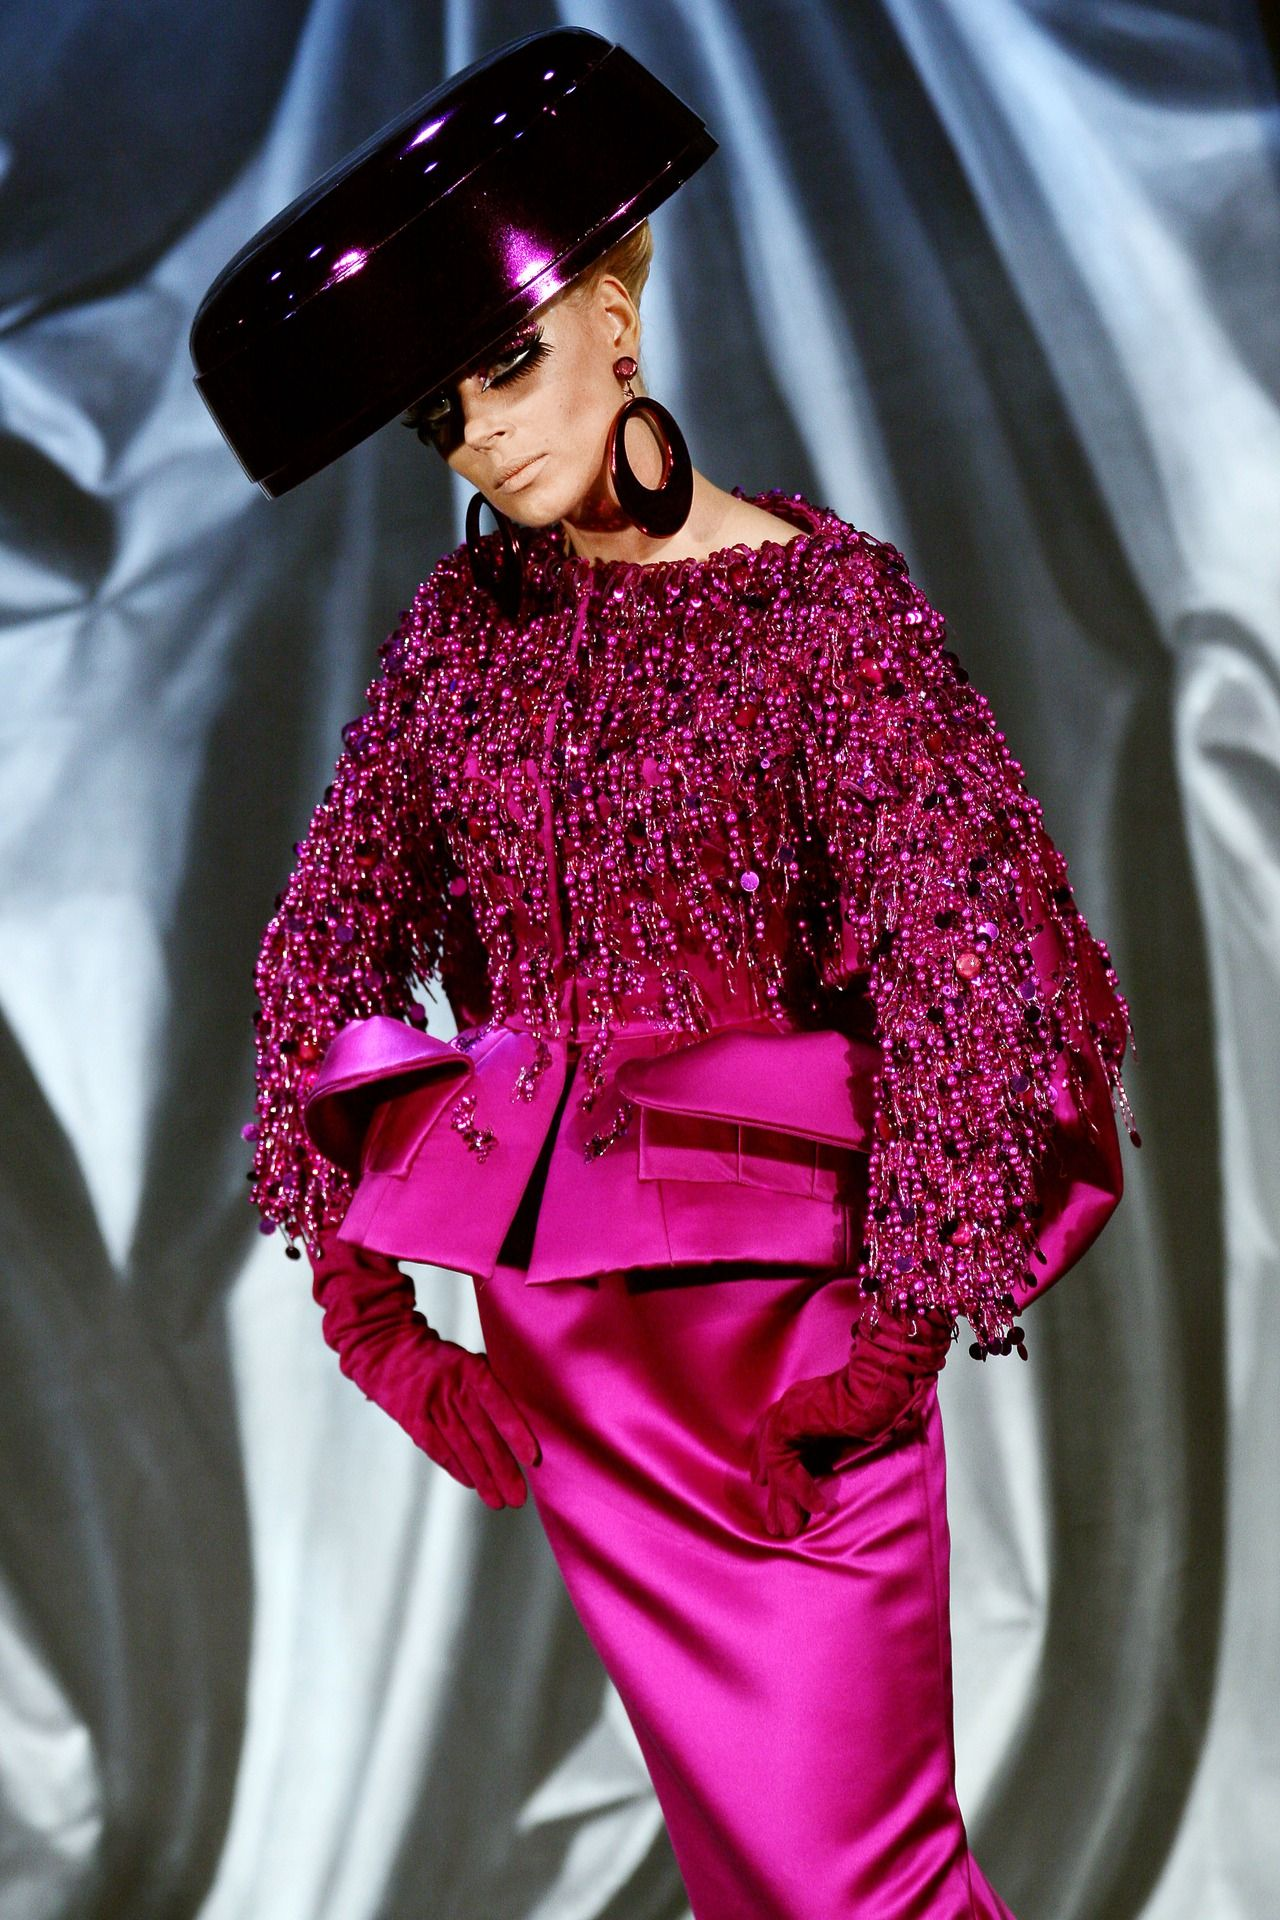 Christian Dior Spring 2008 Haute Couture John Galliano